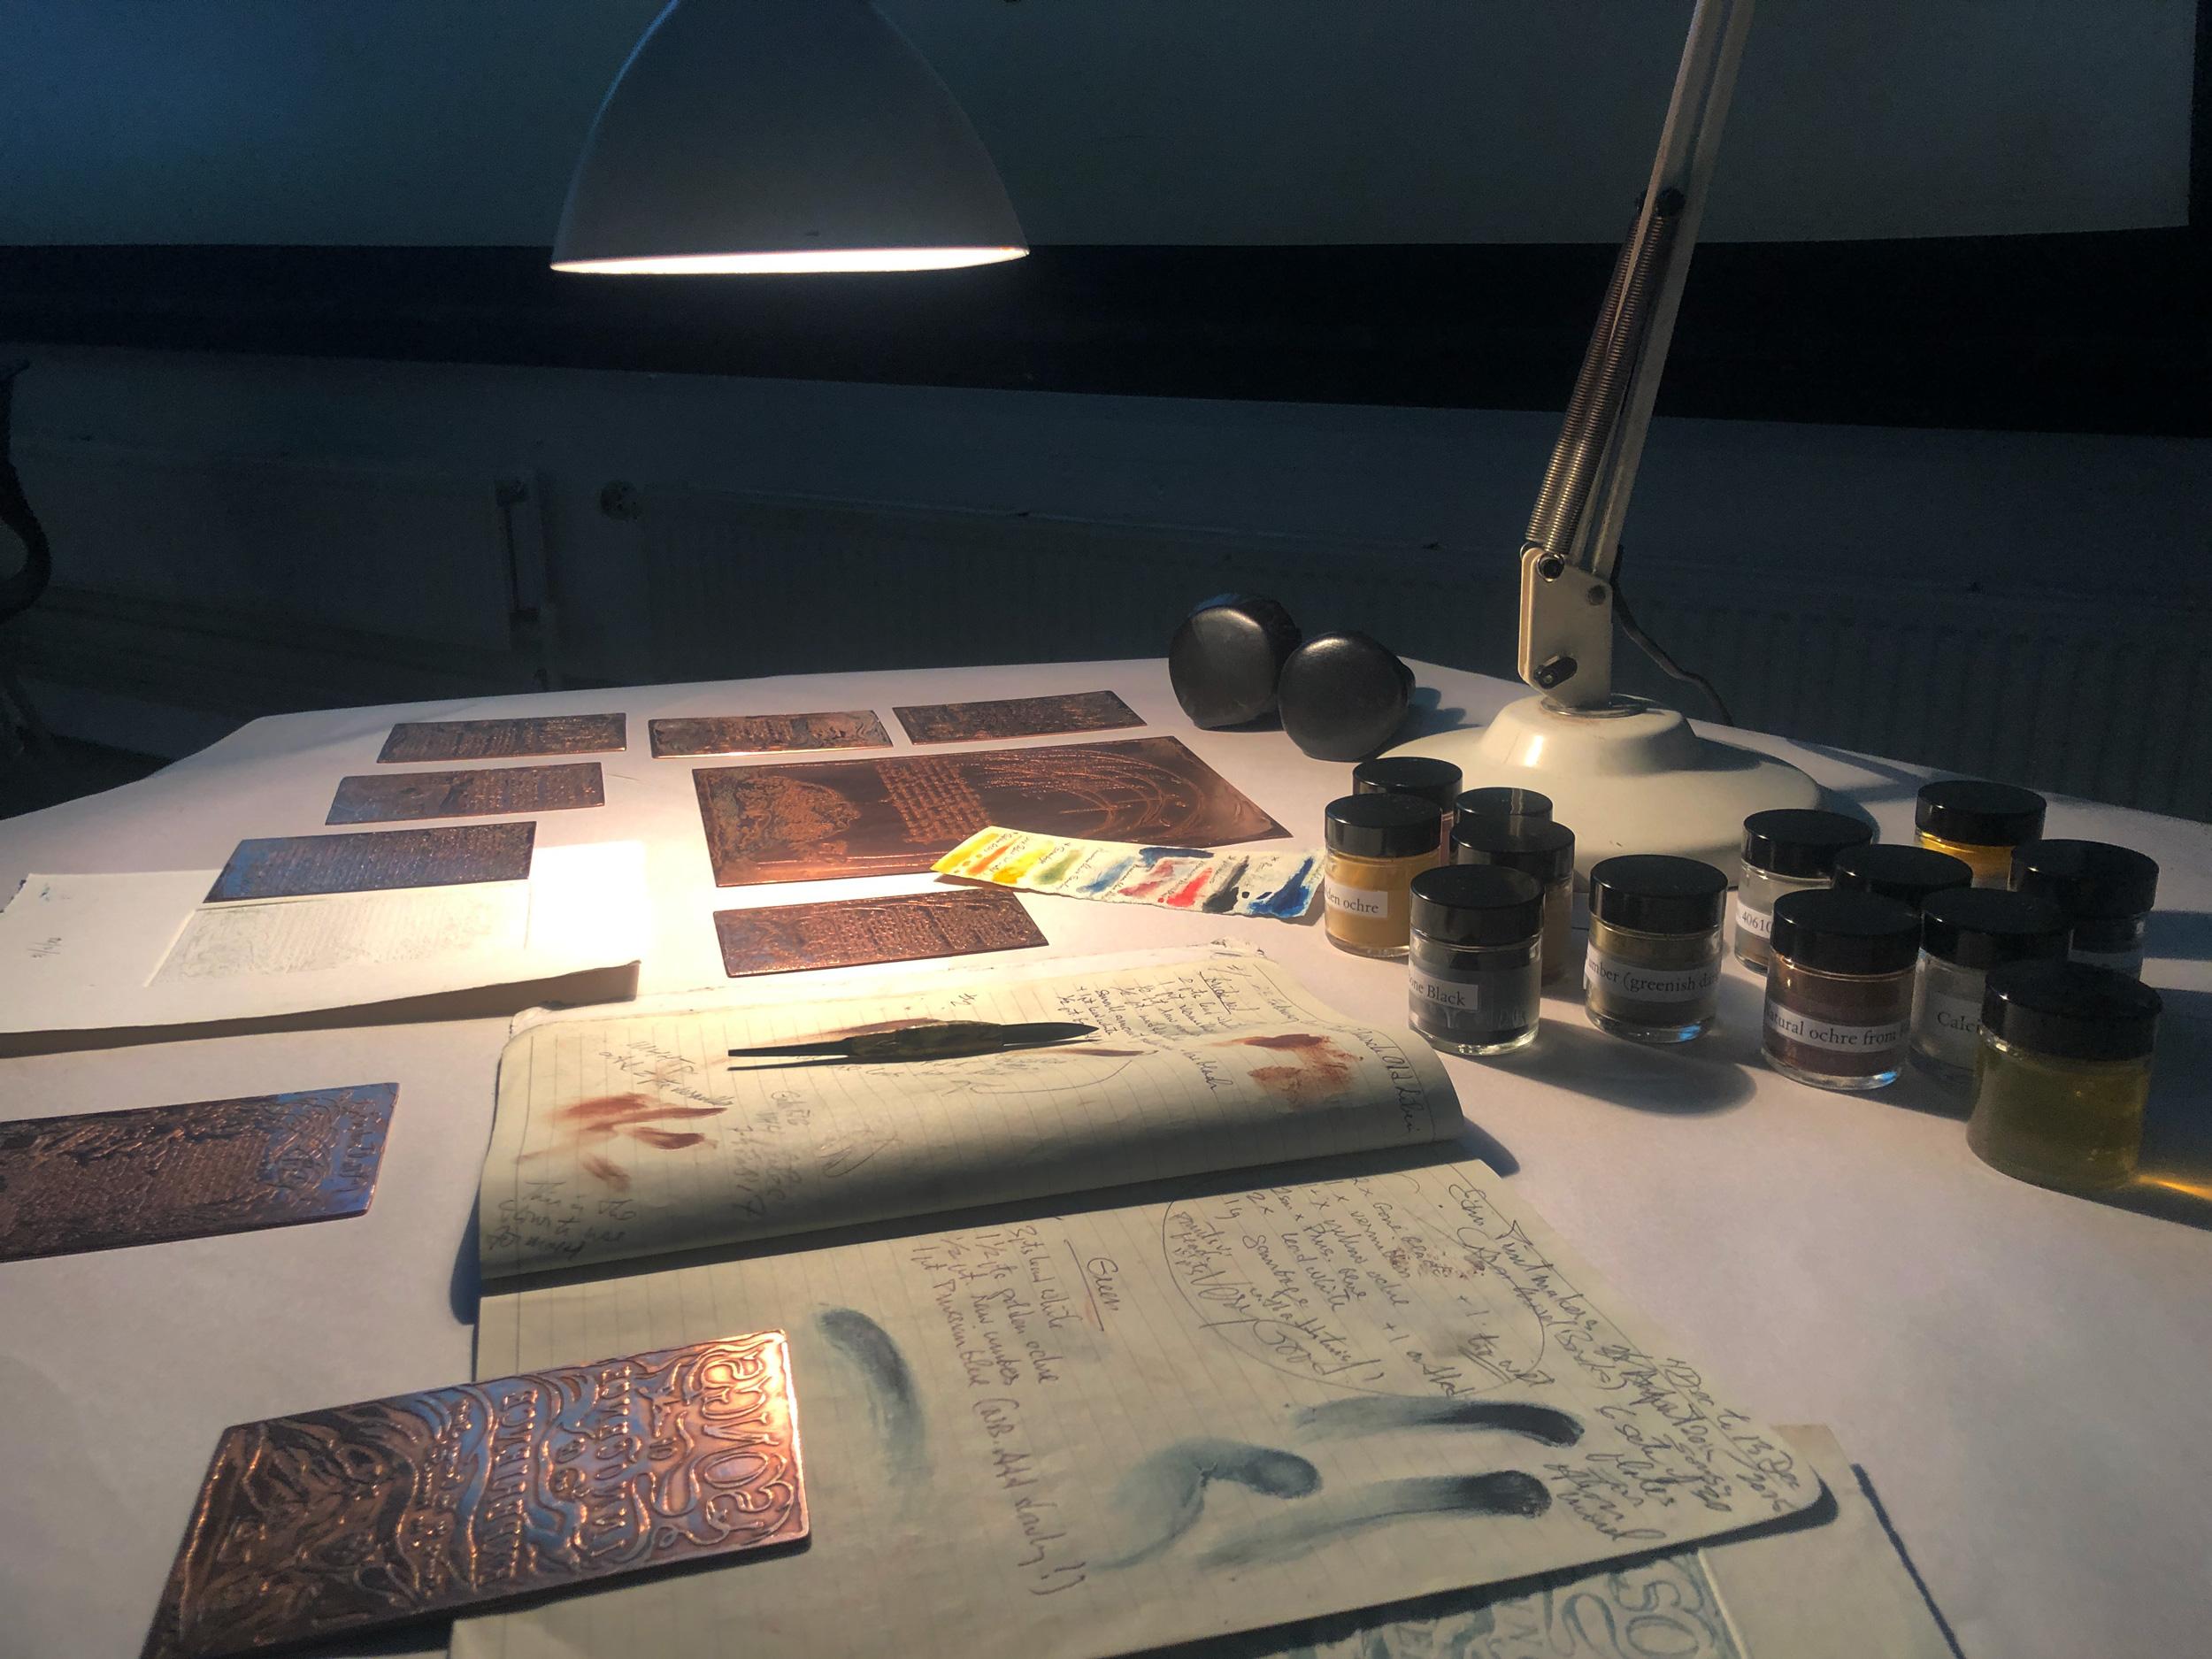 Michael-Phillips-William-Blake-Printmaking-workshop-2.jpg